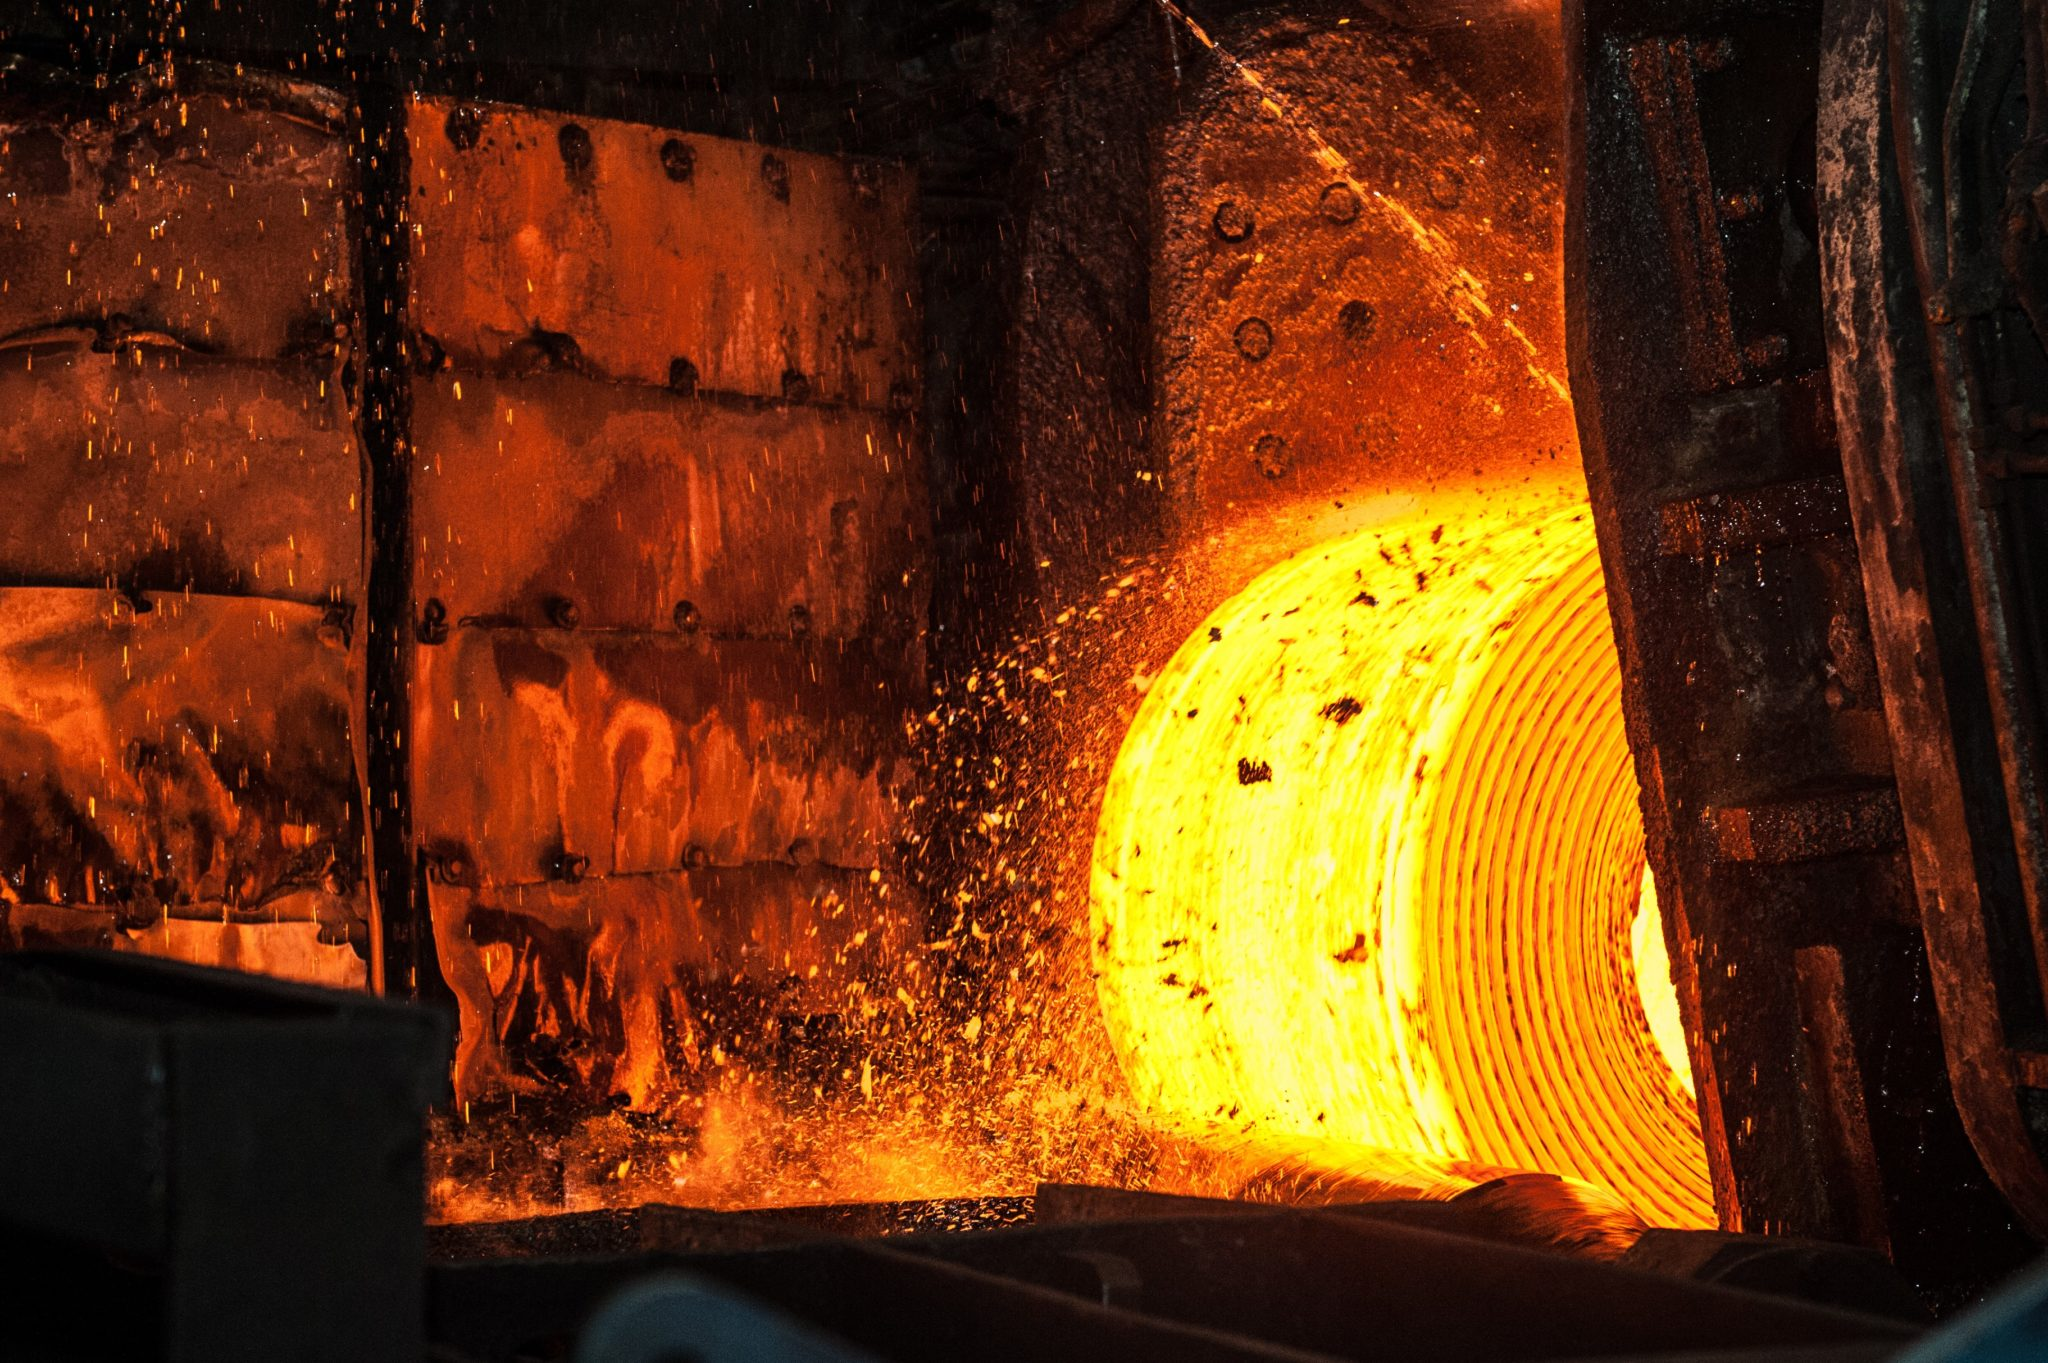 https://www.lone-star.com/wp-content/uploads/2018/01/Smelting-steel-coil.jpg